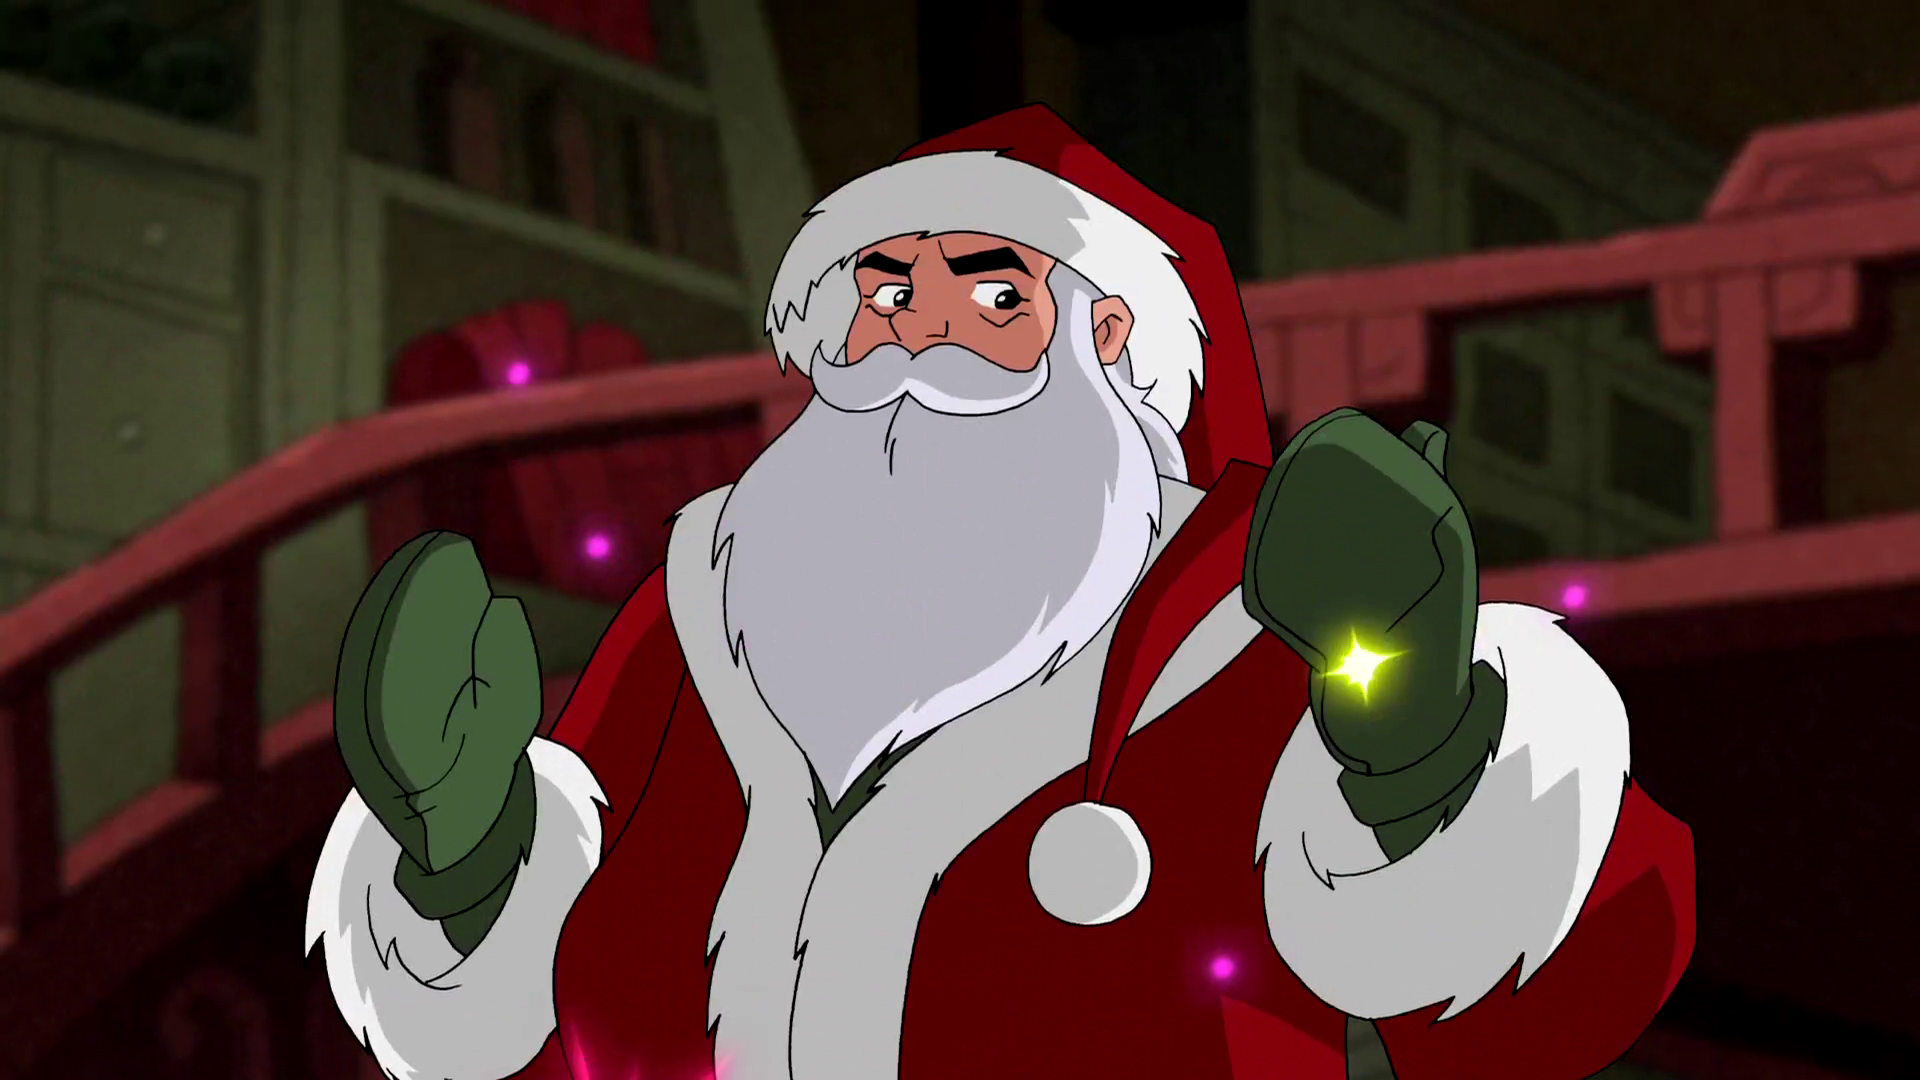 Santa Claus Cartoon Hd Images Free Download